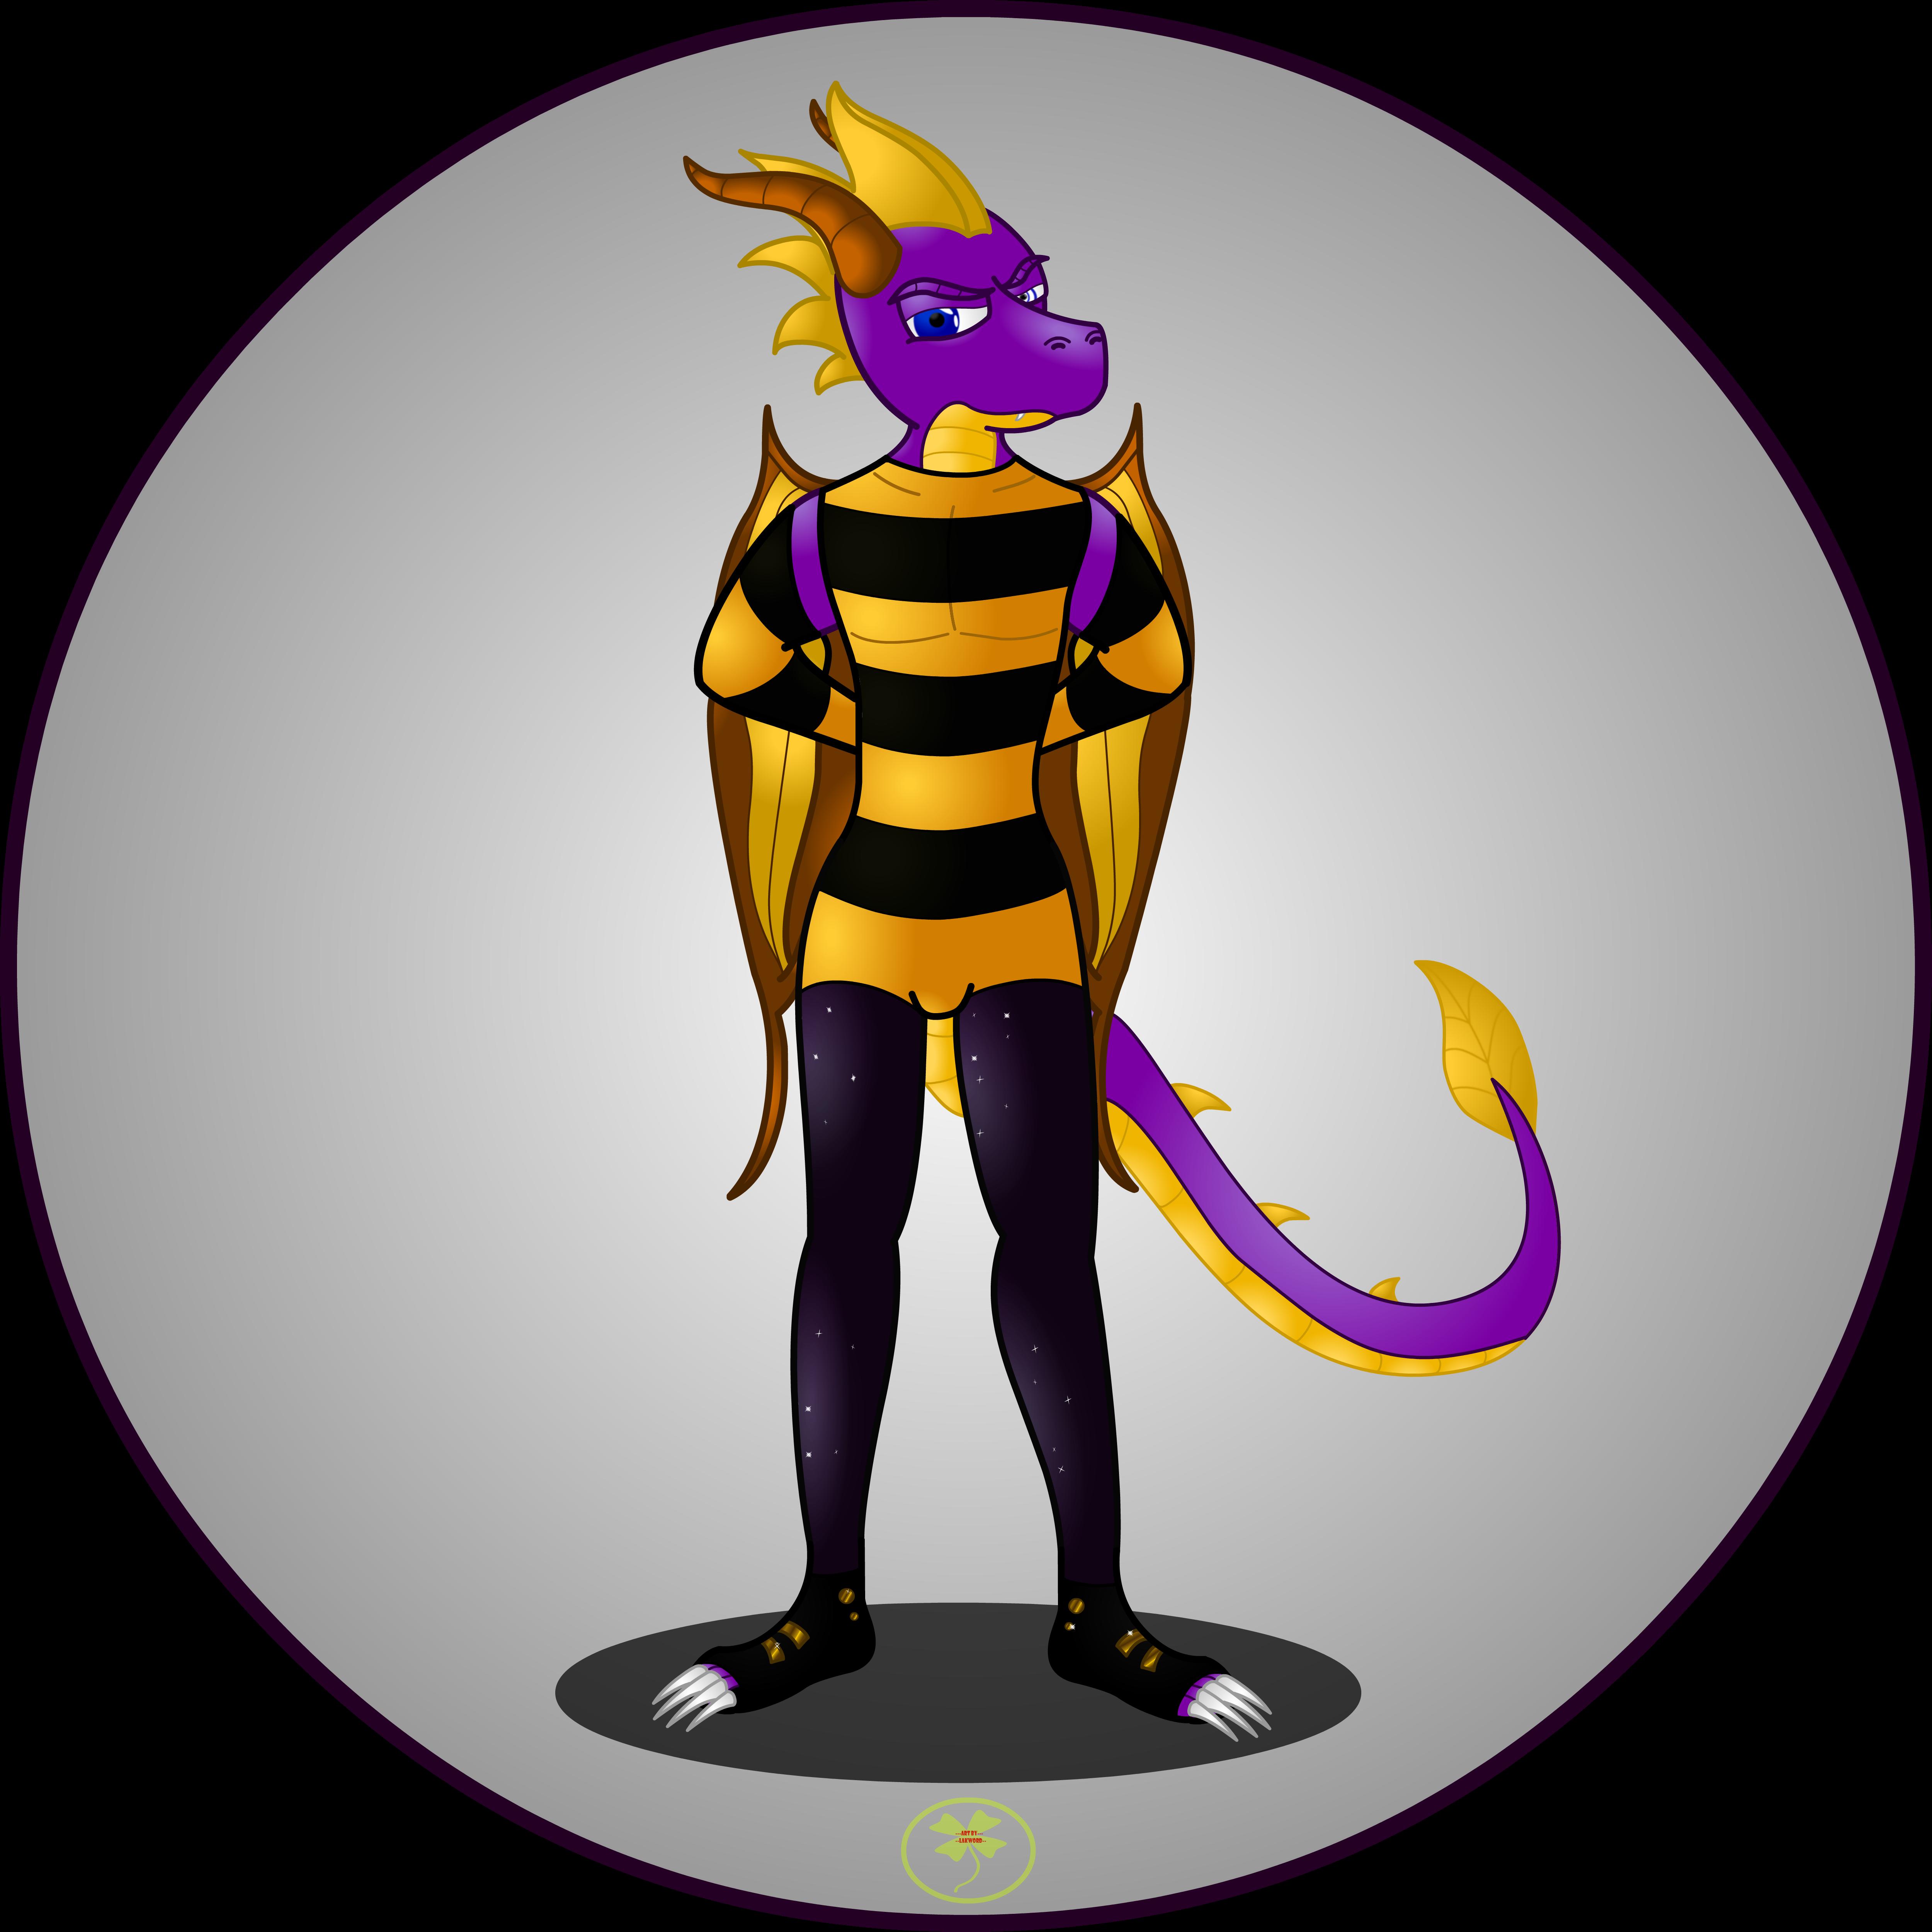 Seperate Spyro Picture by Lakword